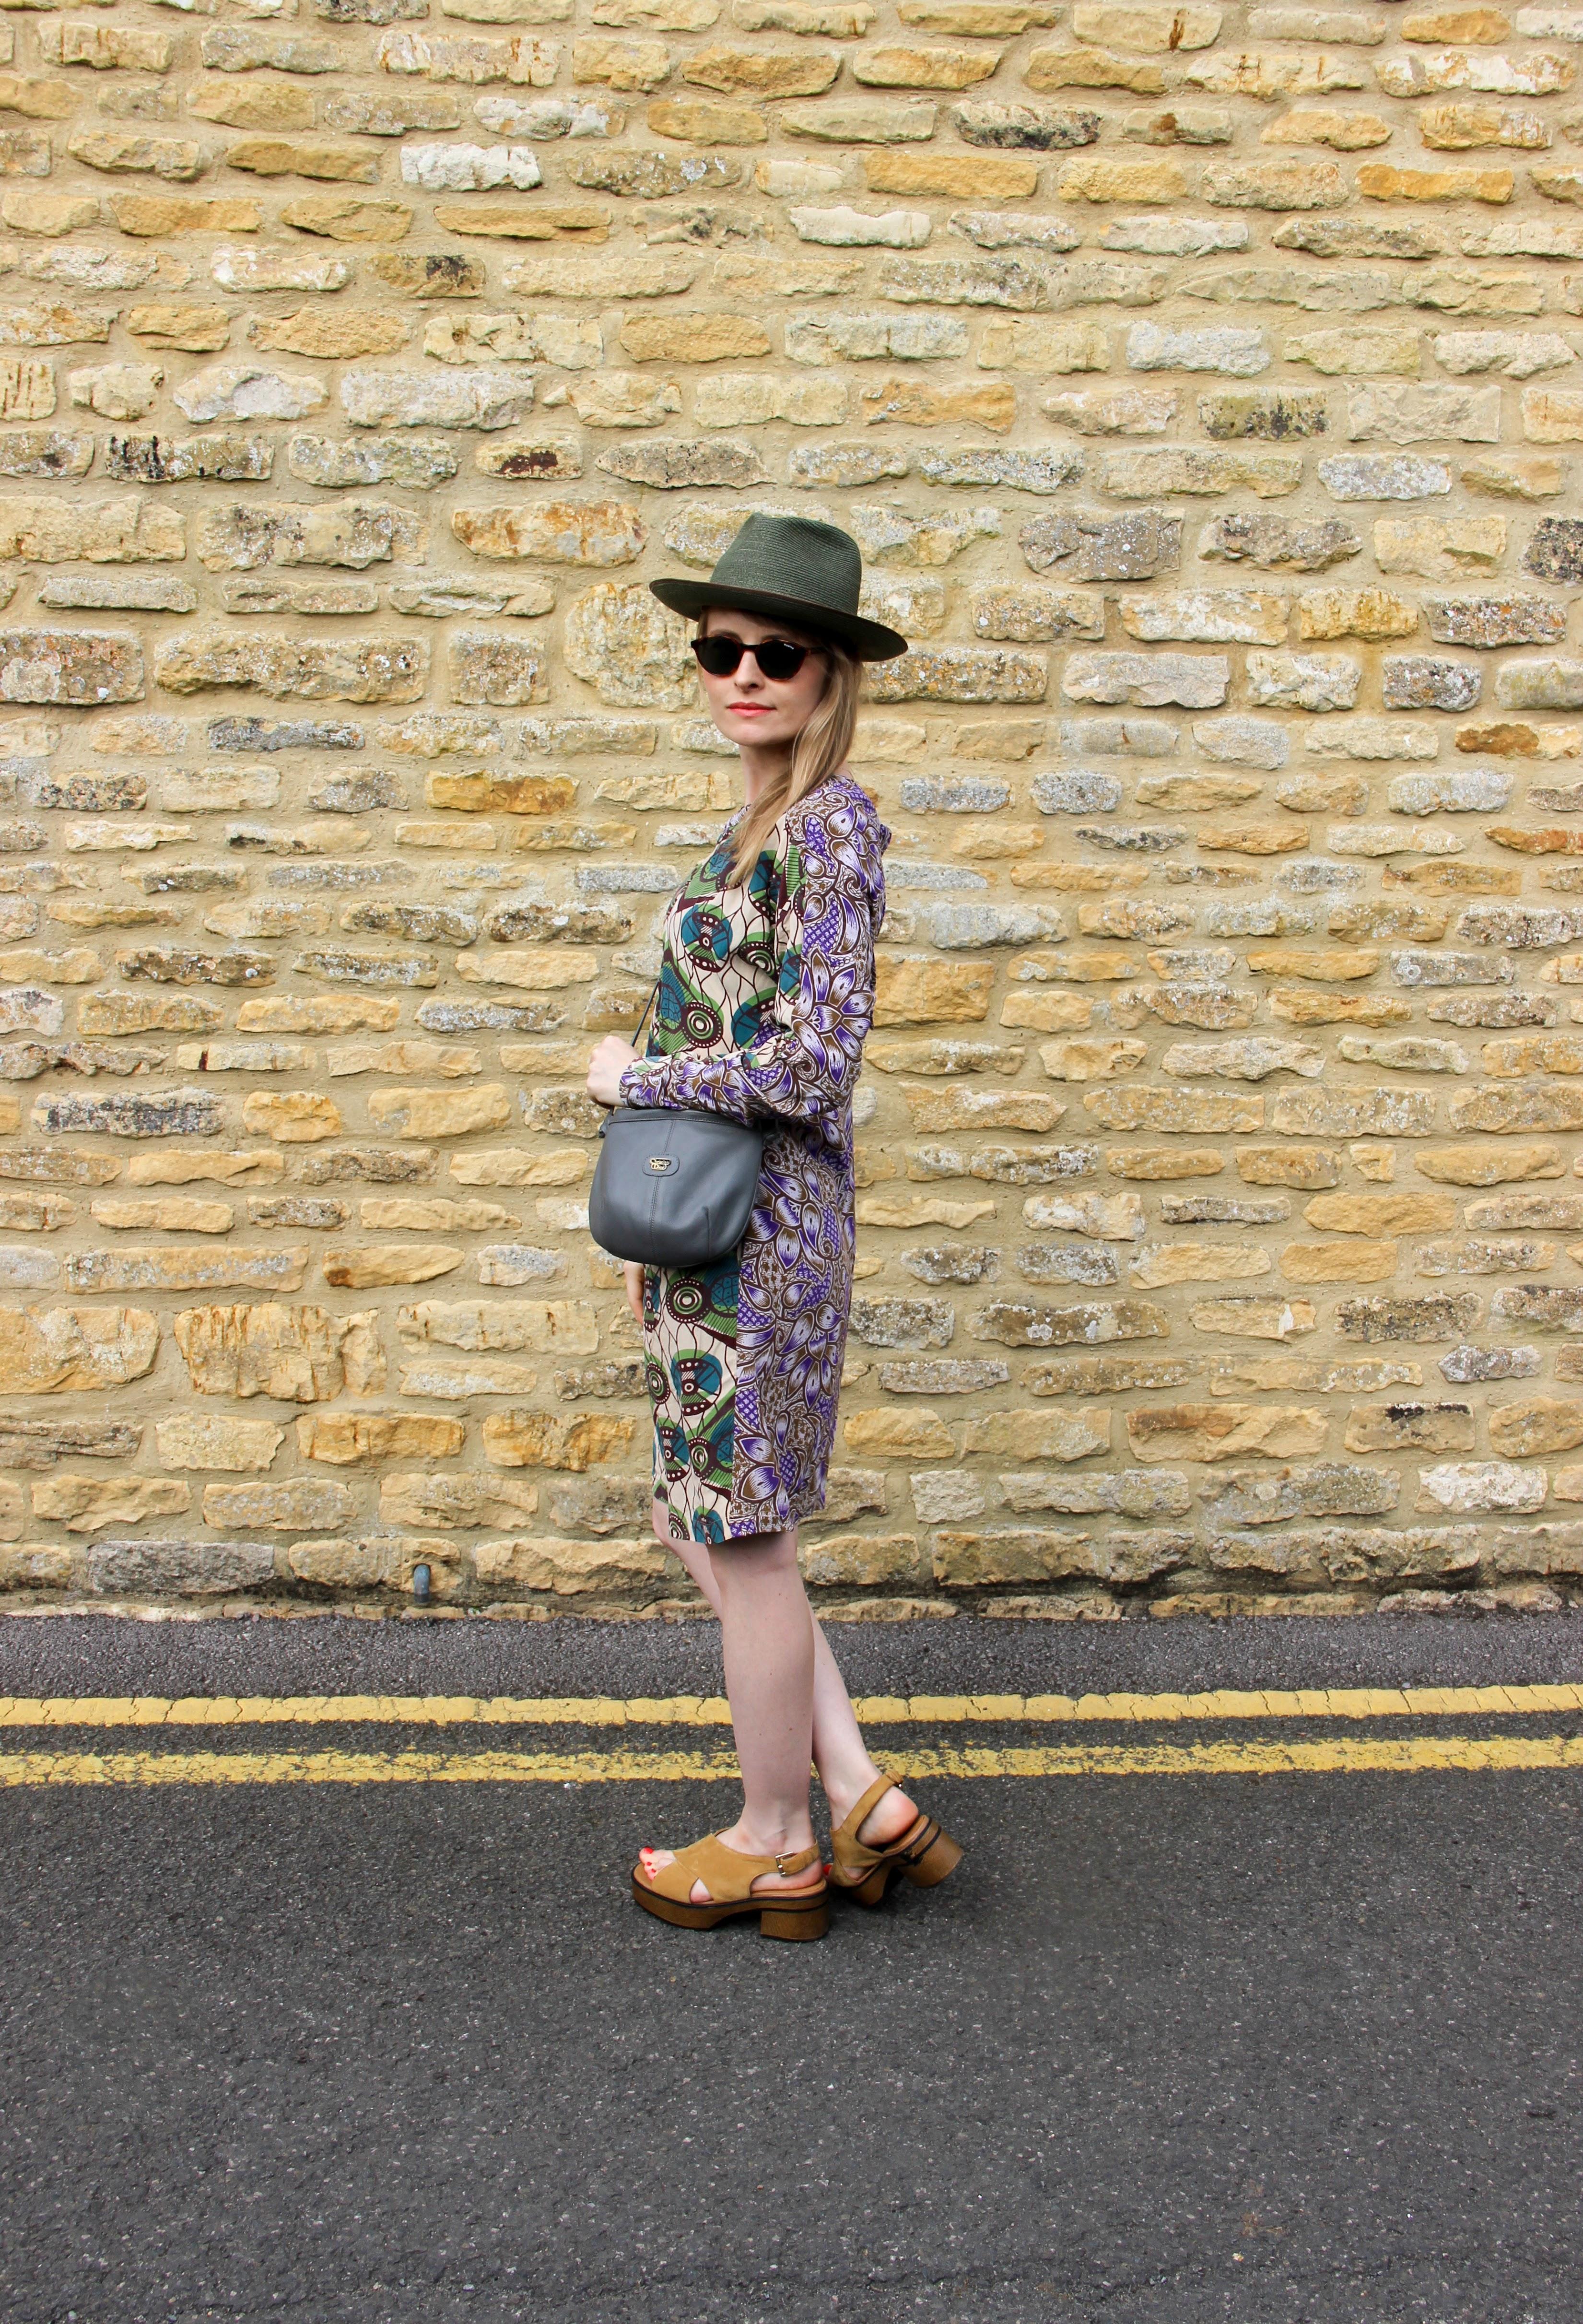 stetson stratoliner by Fashion art media